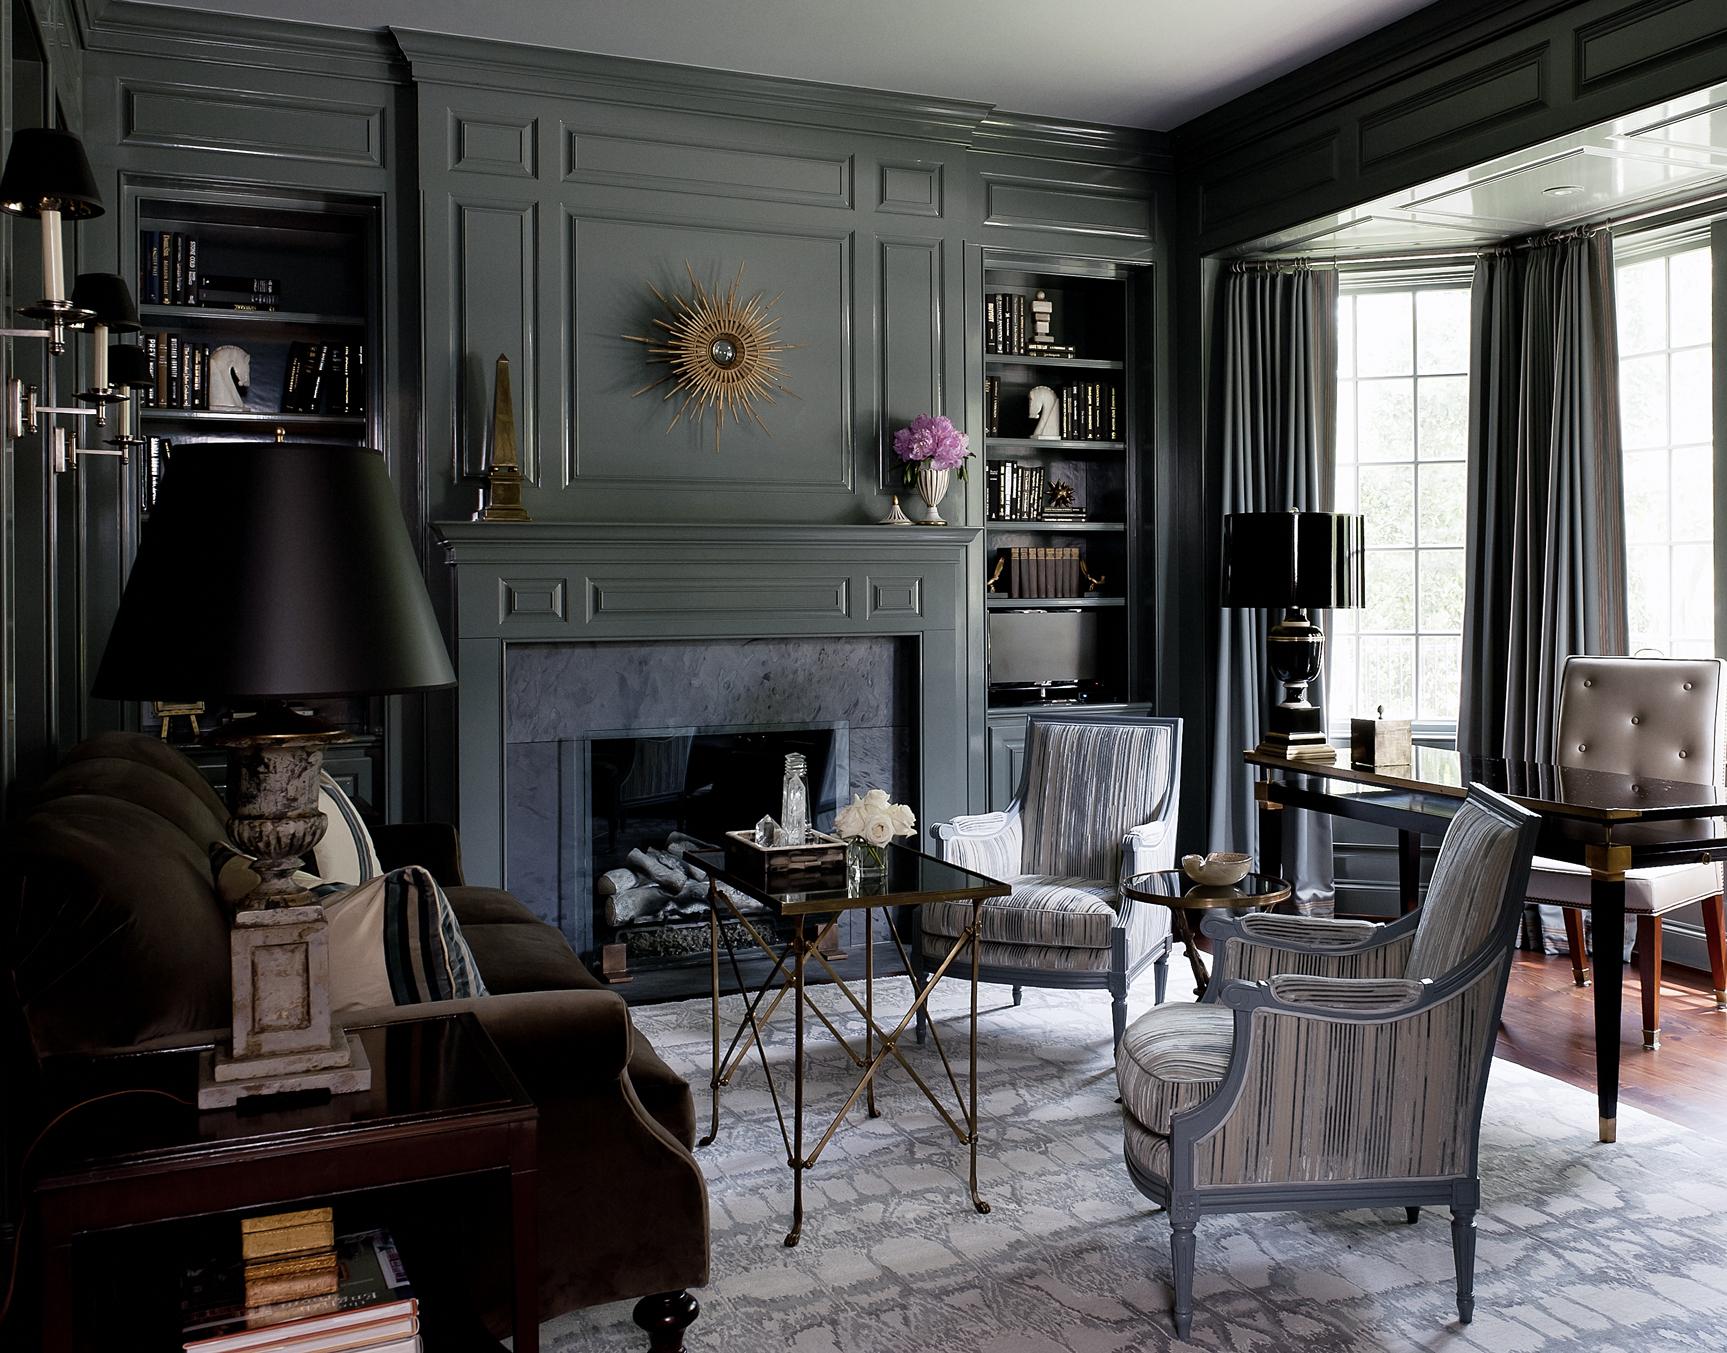 Interior design by Courtney Hill Interiors